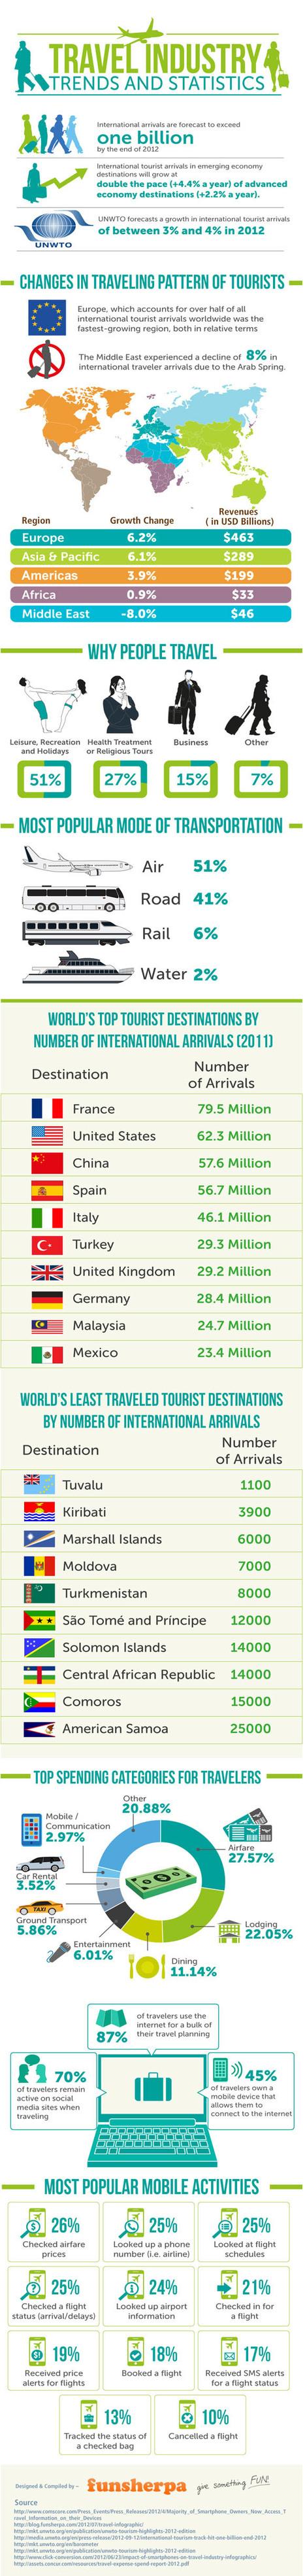 Tendencies del sector del turismo en 2012 #infografia #infographic#tourism   turismo, hotel, apart, restaurantes, huesped, termas, viajes   Scoop.it